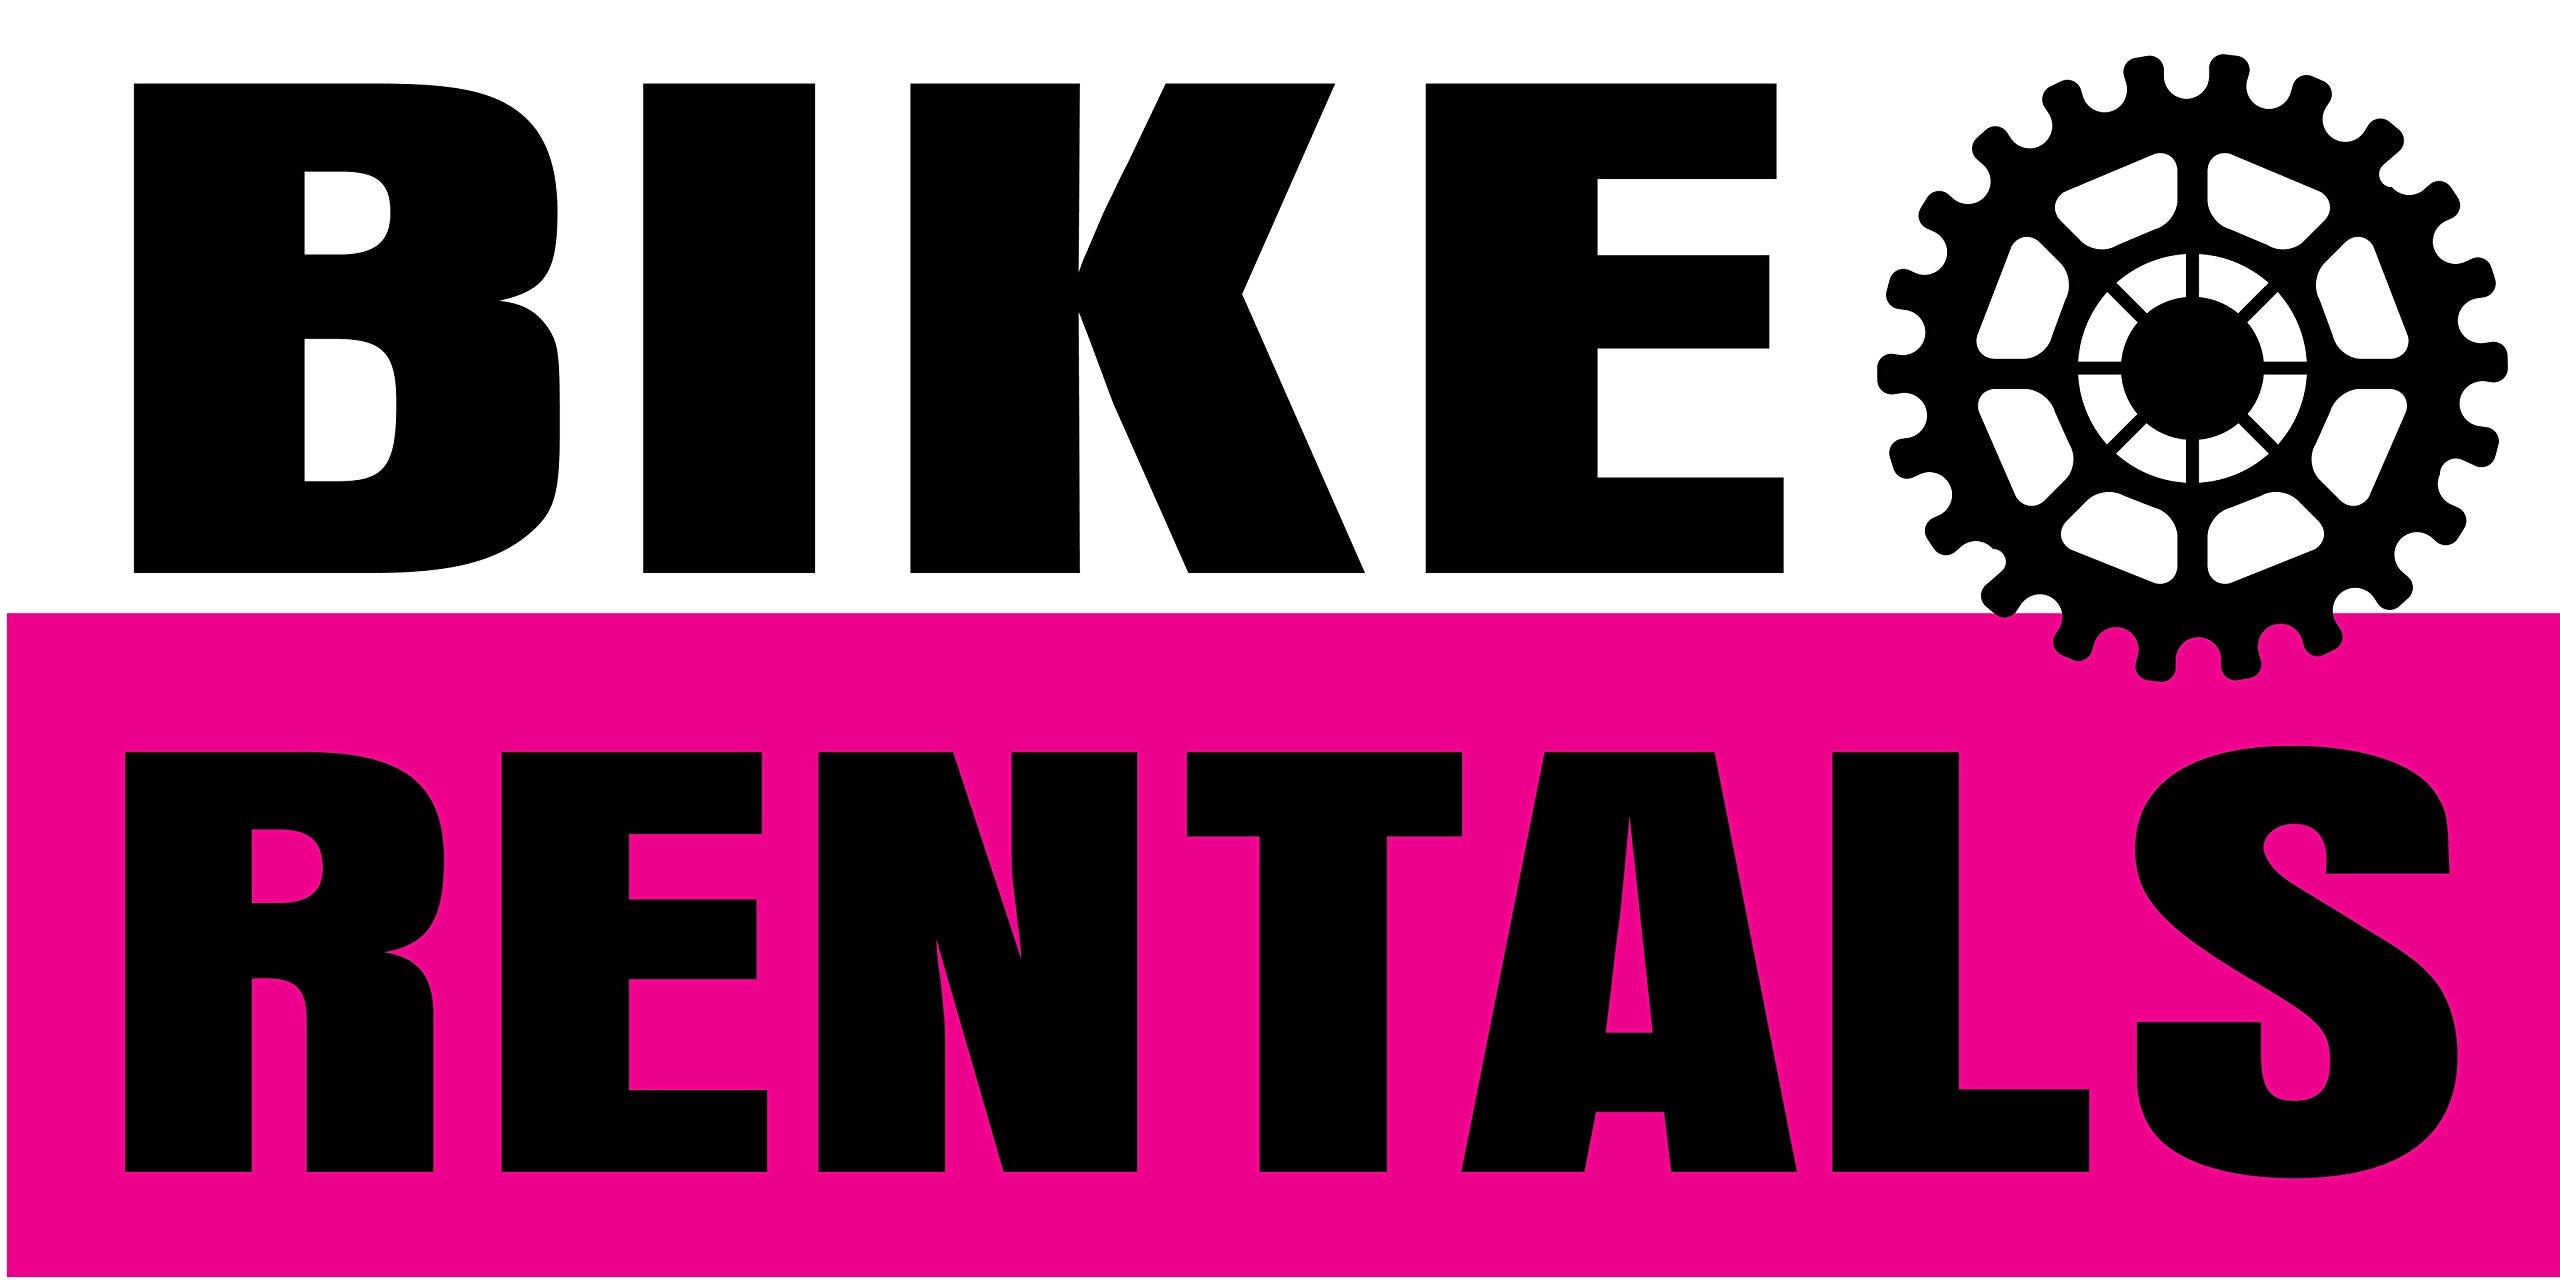 Pre-Printed Bike Rentals Banner - Stripe - Pink (10' x 5')